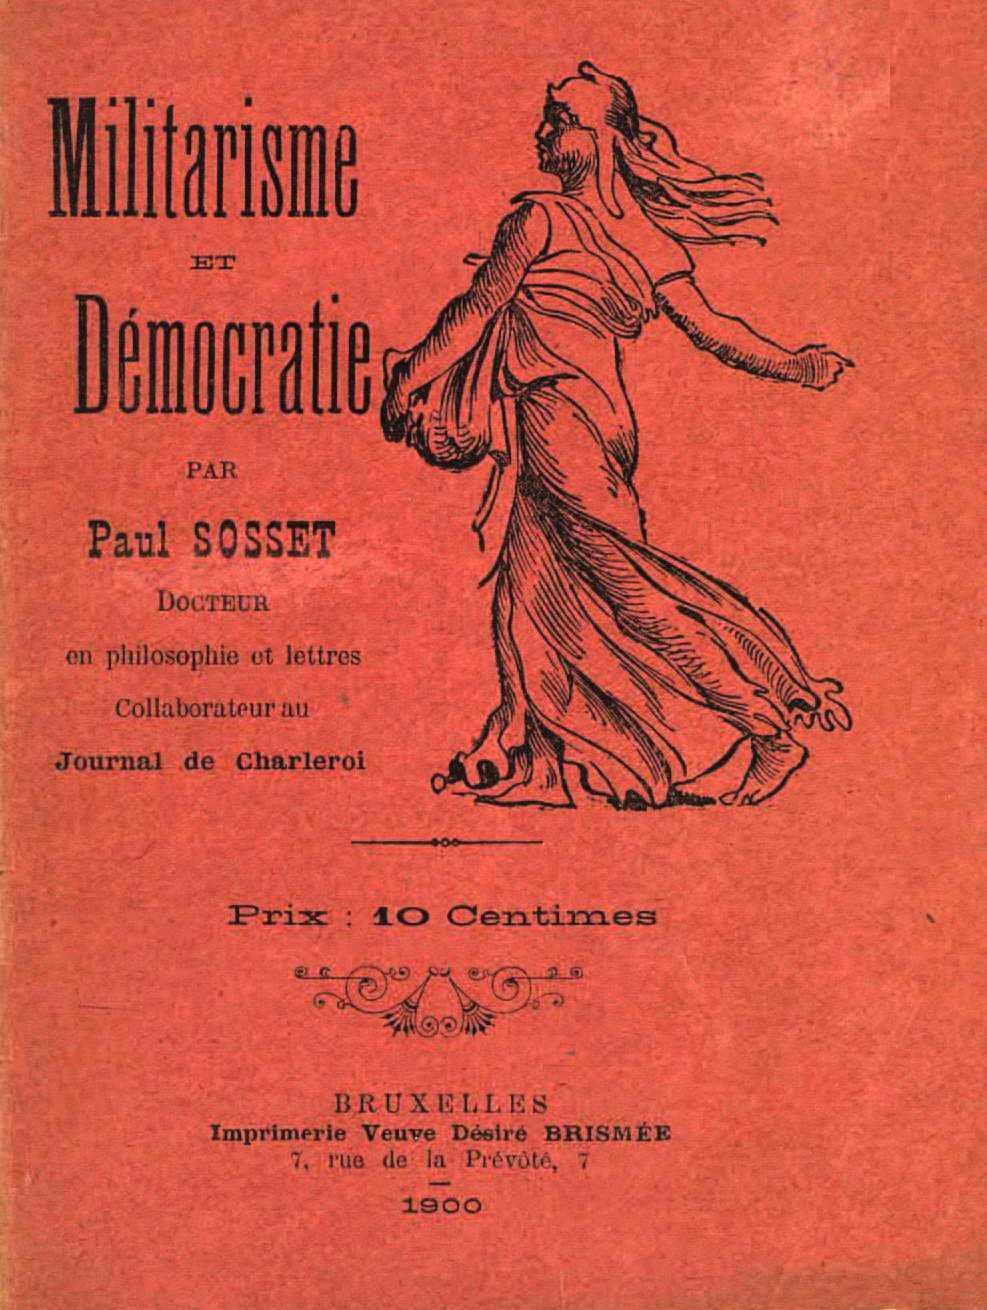 Llibre de Paul Sosset